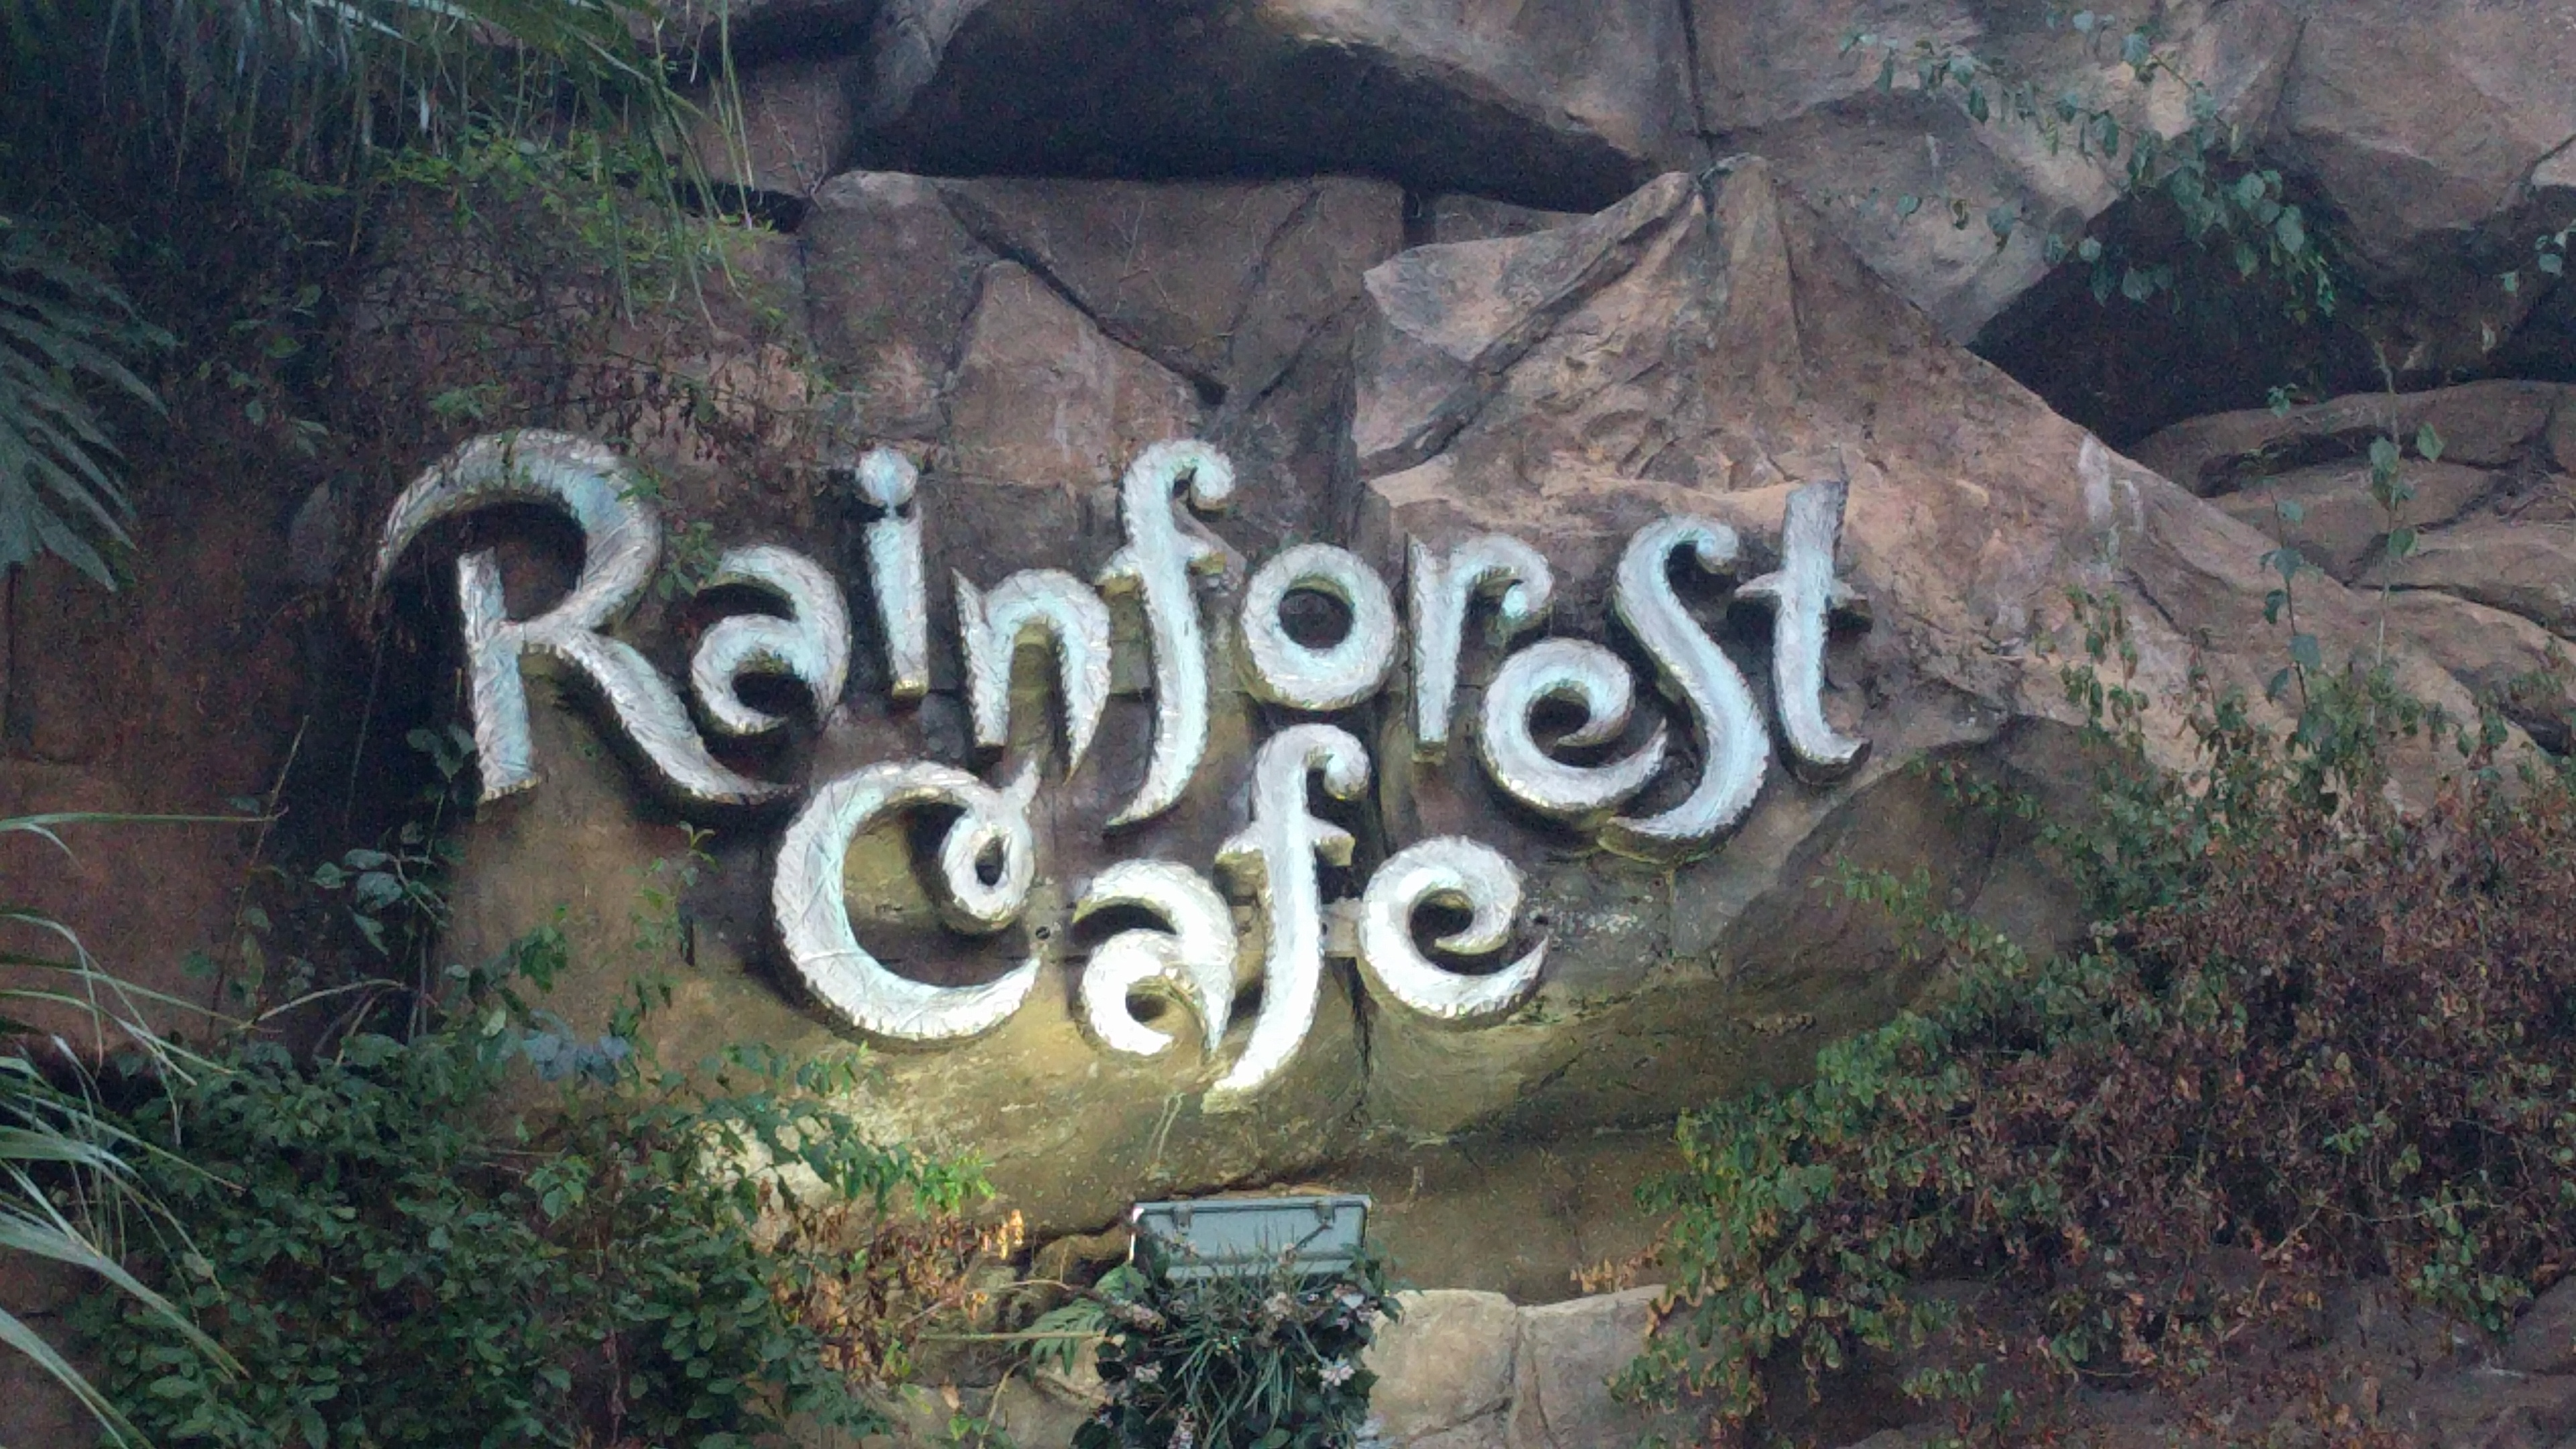 Rainforest Cafe - Wikiwand on science cafe, halloween cafe, corner bakery cafe, jungle cafe, zoo cafe, aquarium cafe, blue cafe, vegas cafe, sunrise cafe, sandella's flatbread cafe, hardrock cafe, animal cafe, first hard rock cafe, london cafe, new hard rock cafe, disney cafe, t-rex cafe, island cafe, space cafe, urbane cafe,